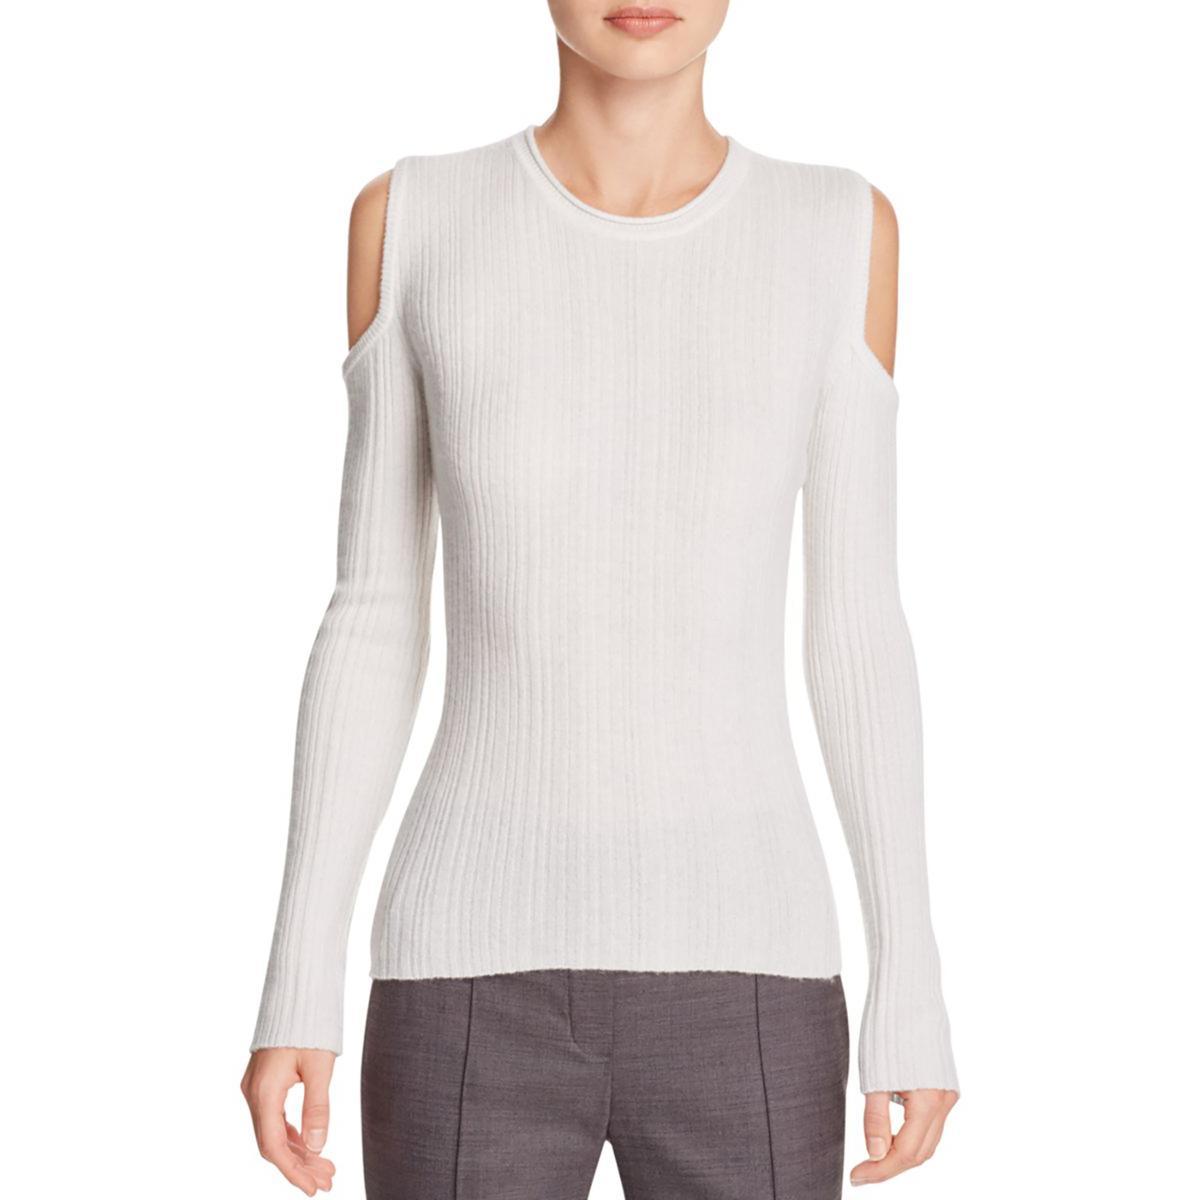 Elie Tahari Womens Marlah Wool Cashmere Pullover Sweater by Elie Tahari